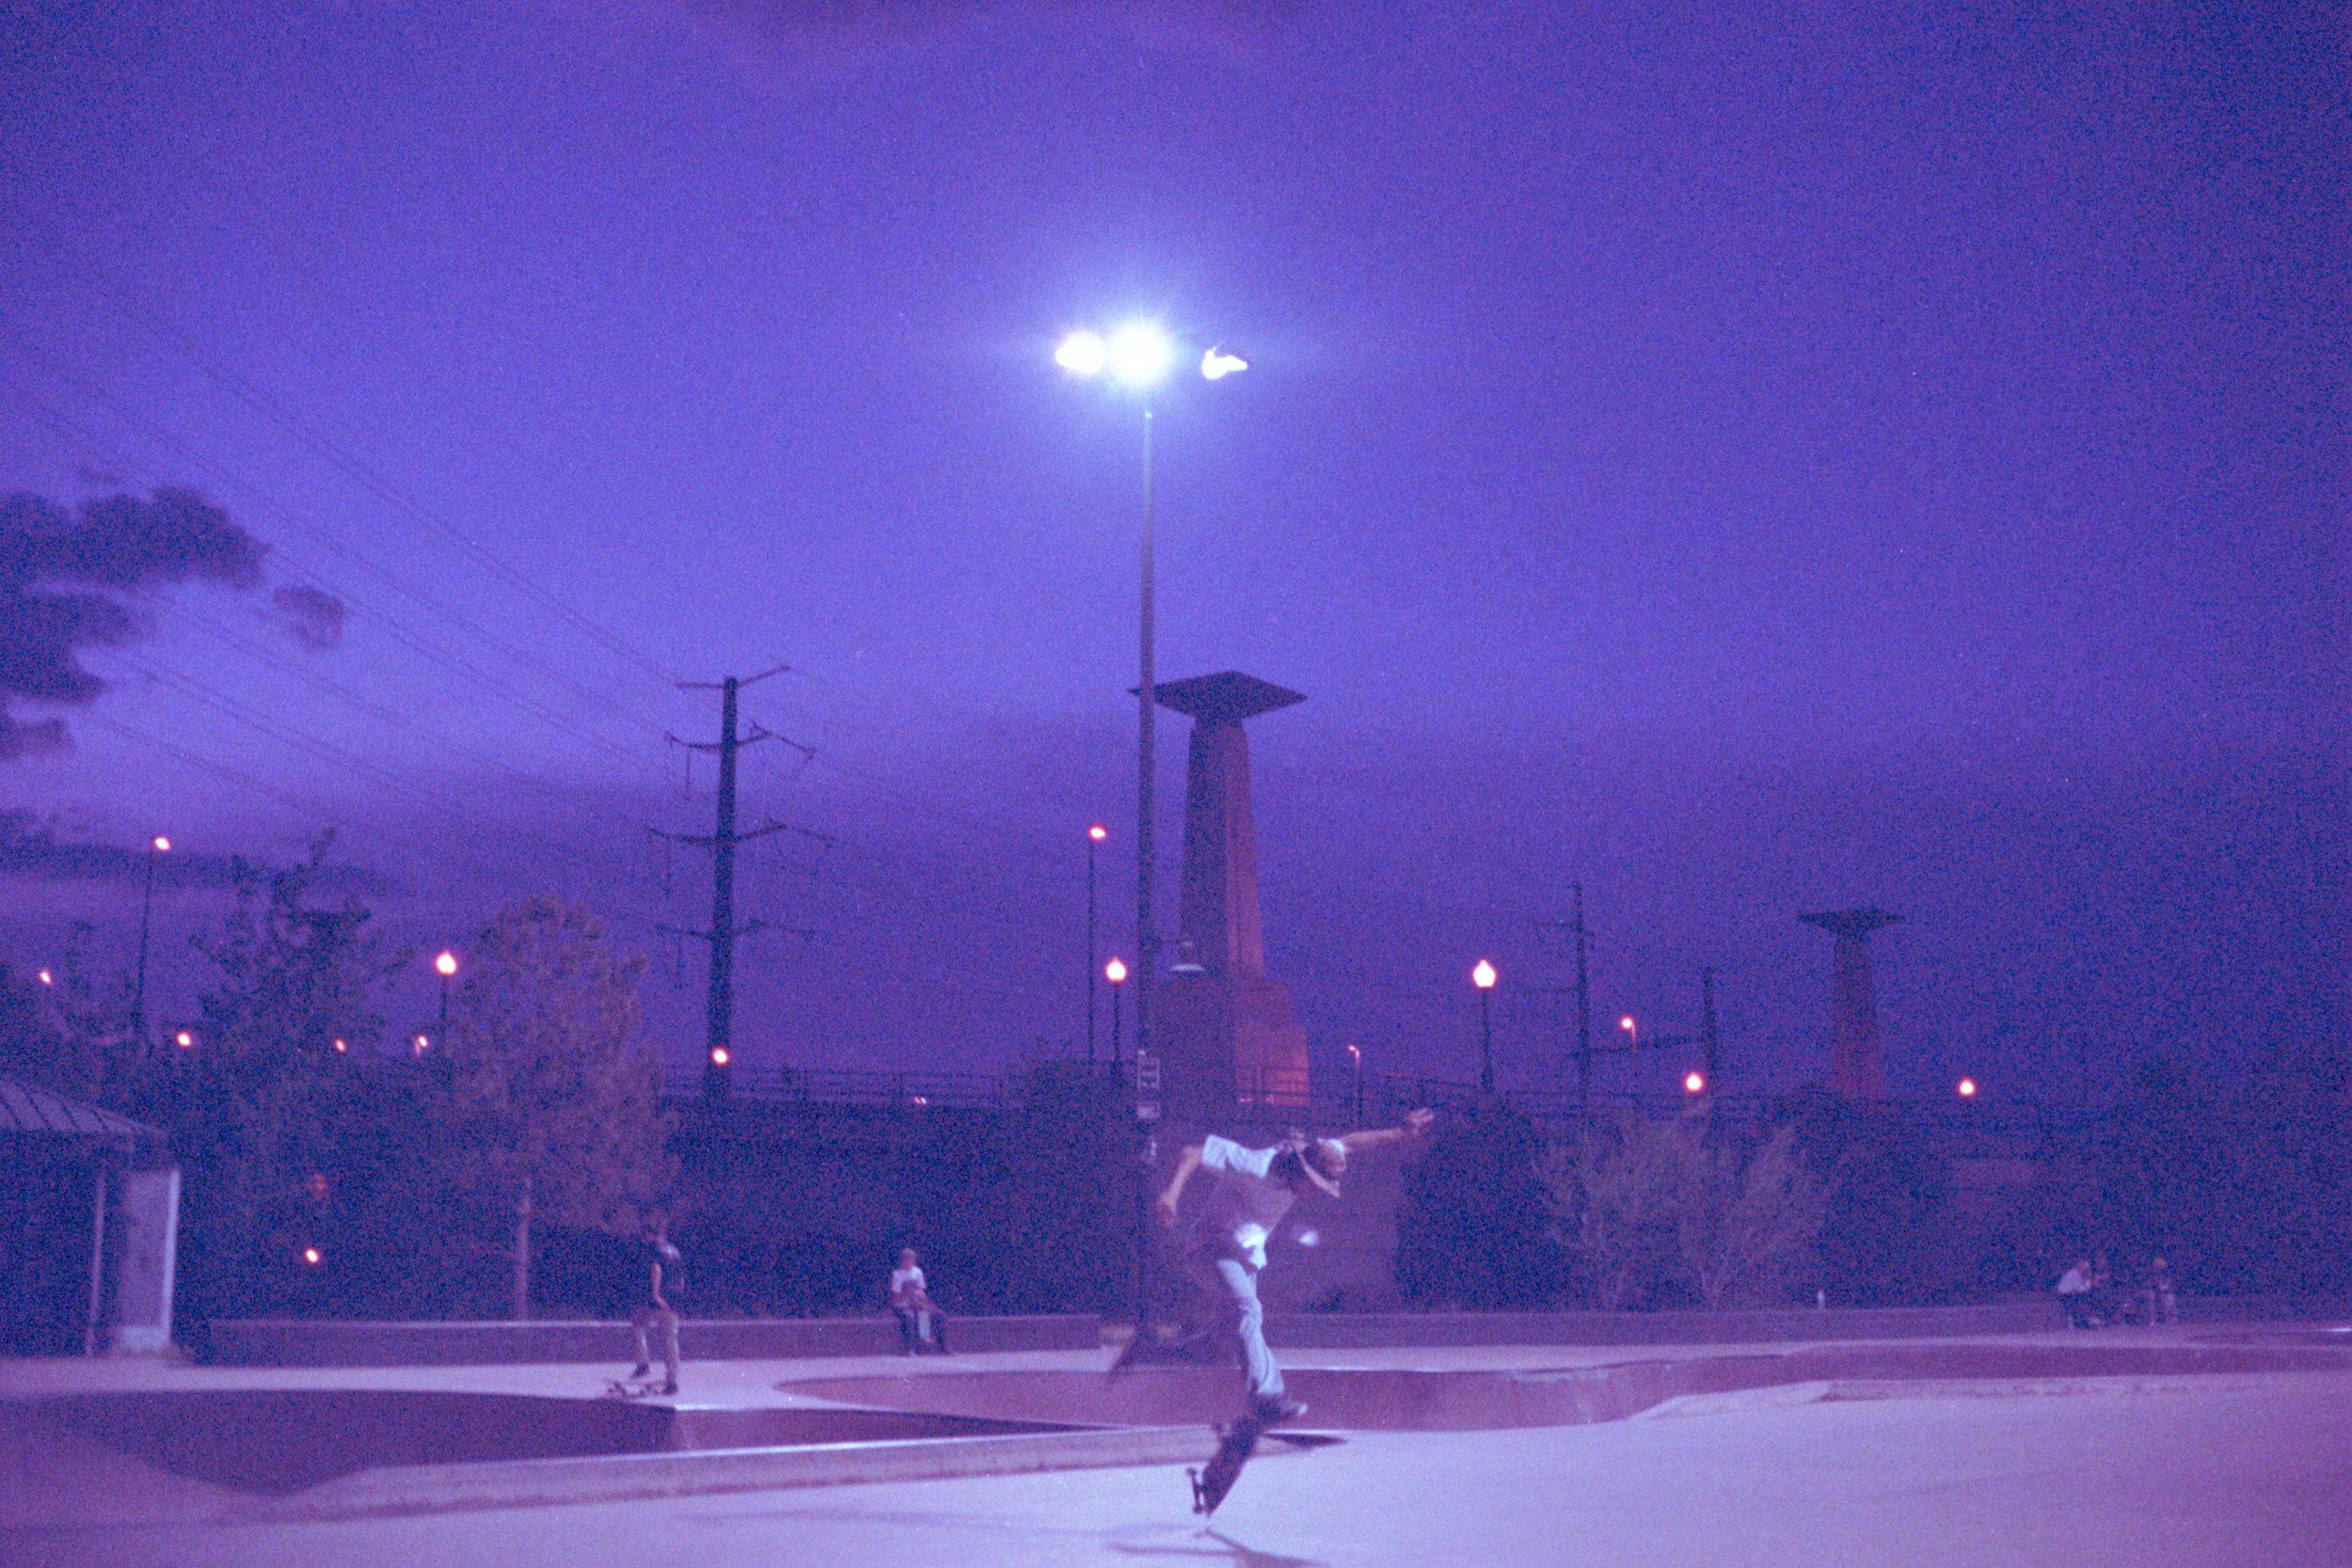 night_skate.jpg